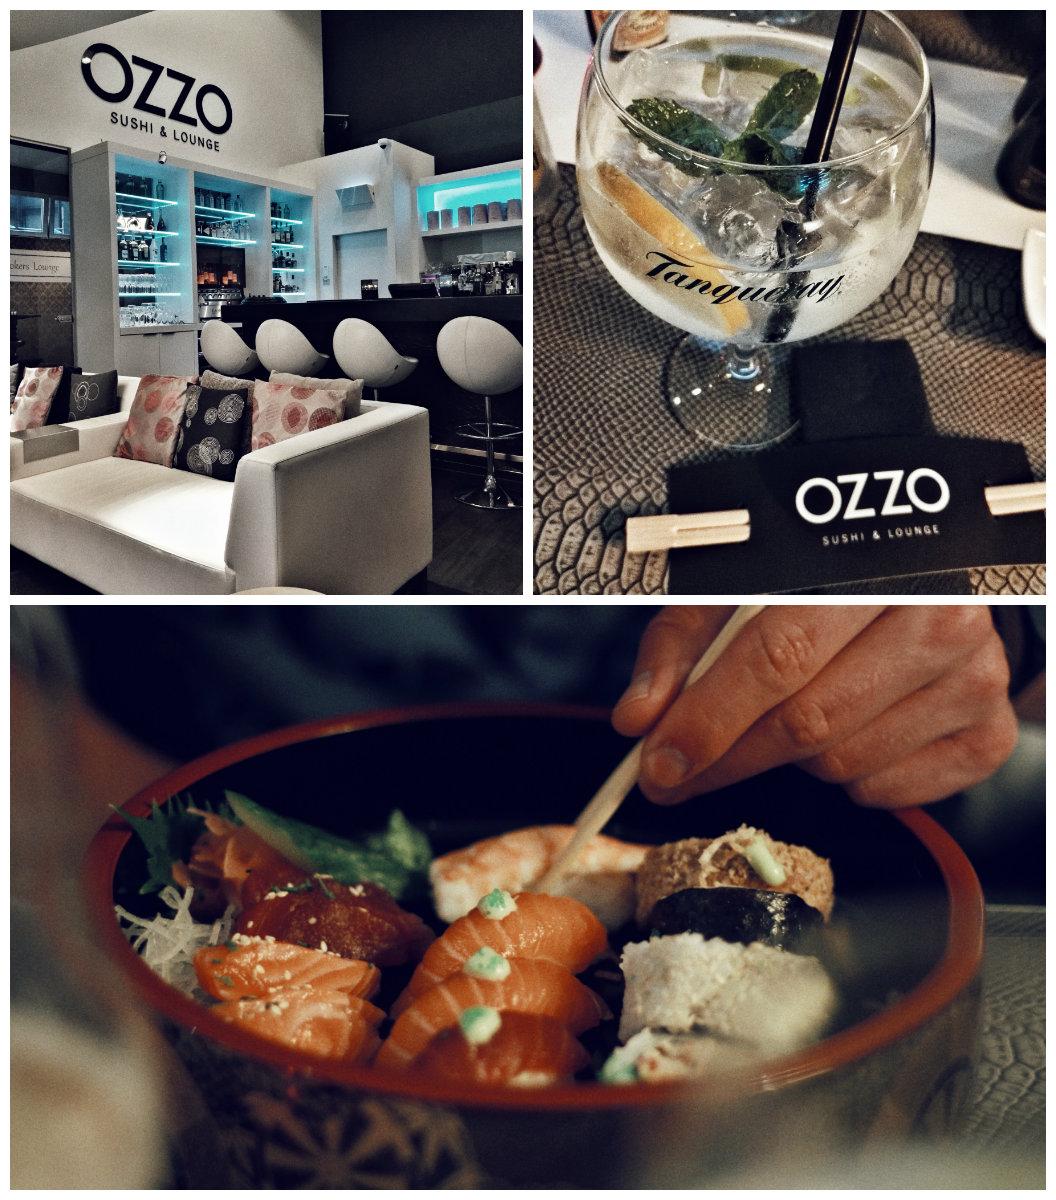 OZZO sushi & lounge